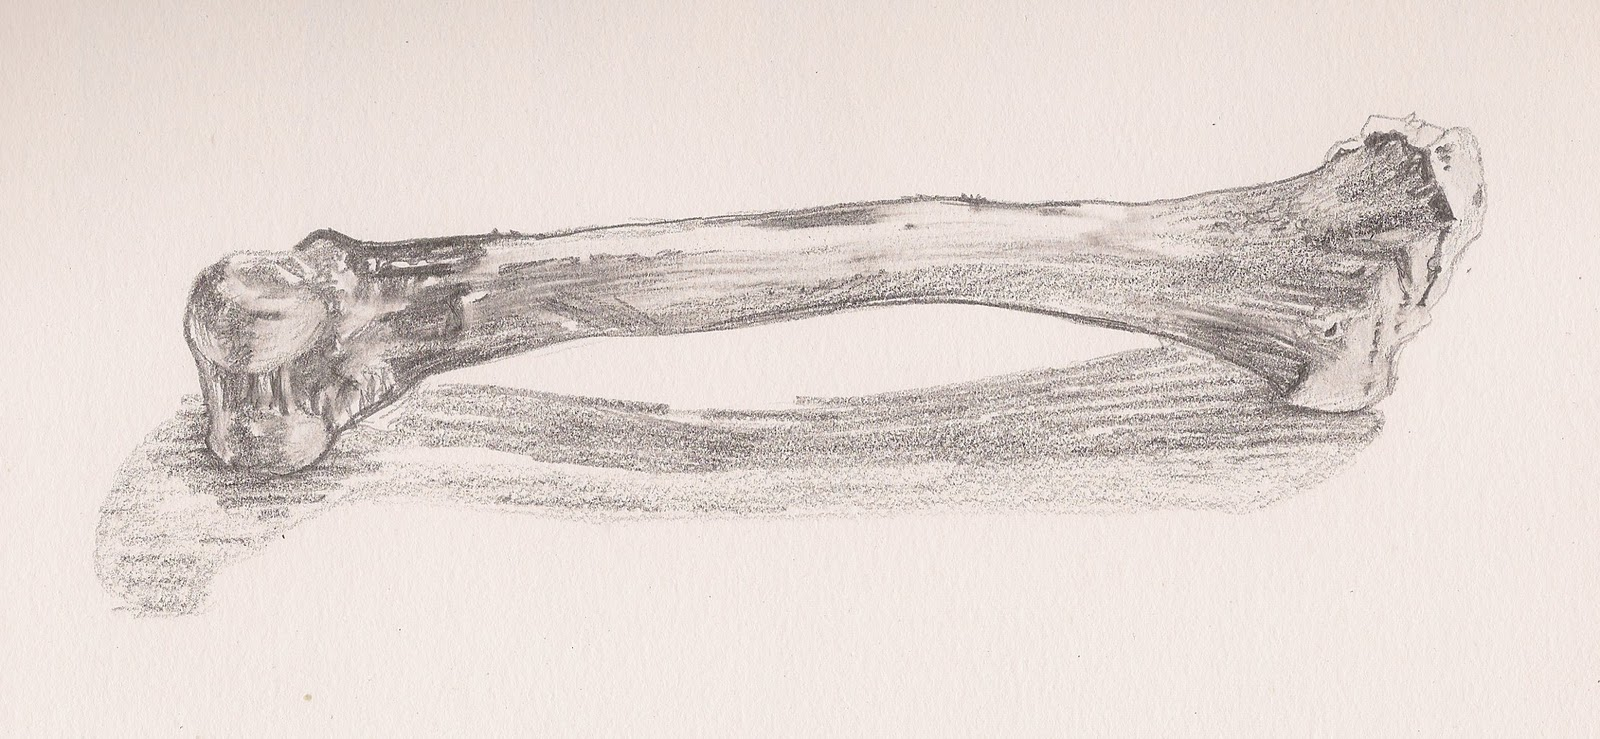 1600x739 Sketch A Day 2011 12111